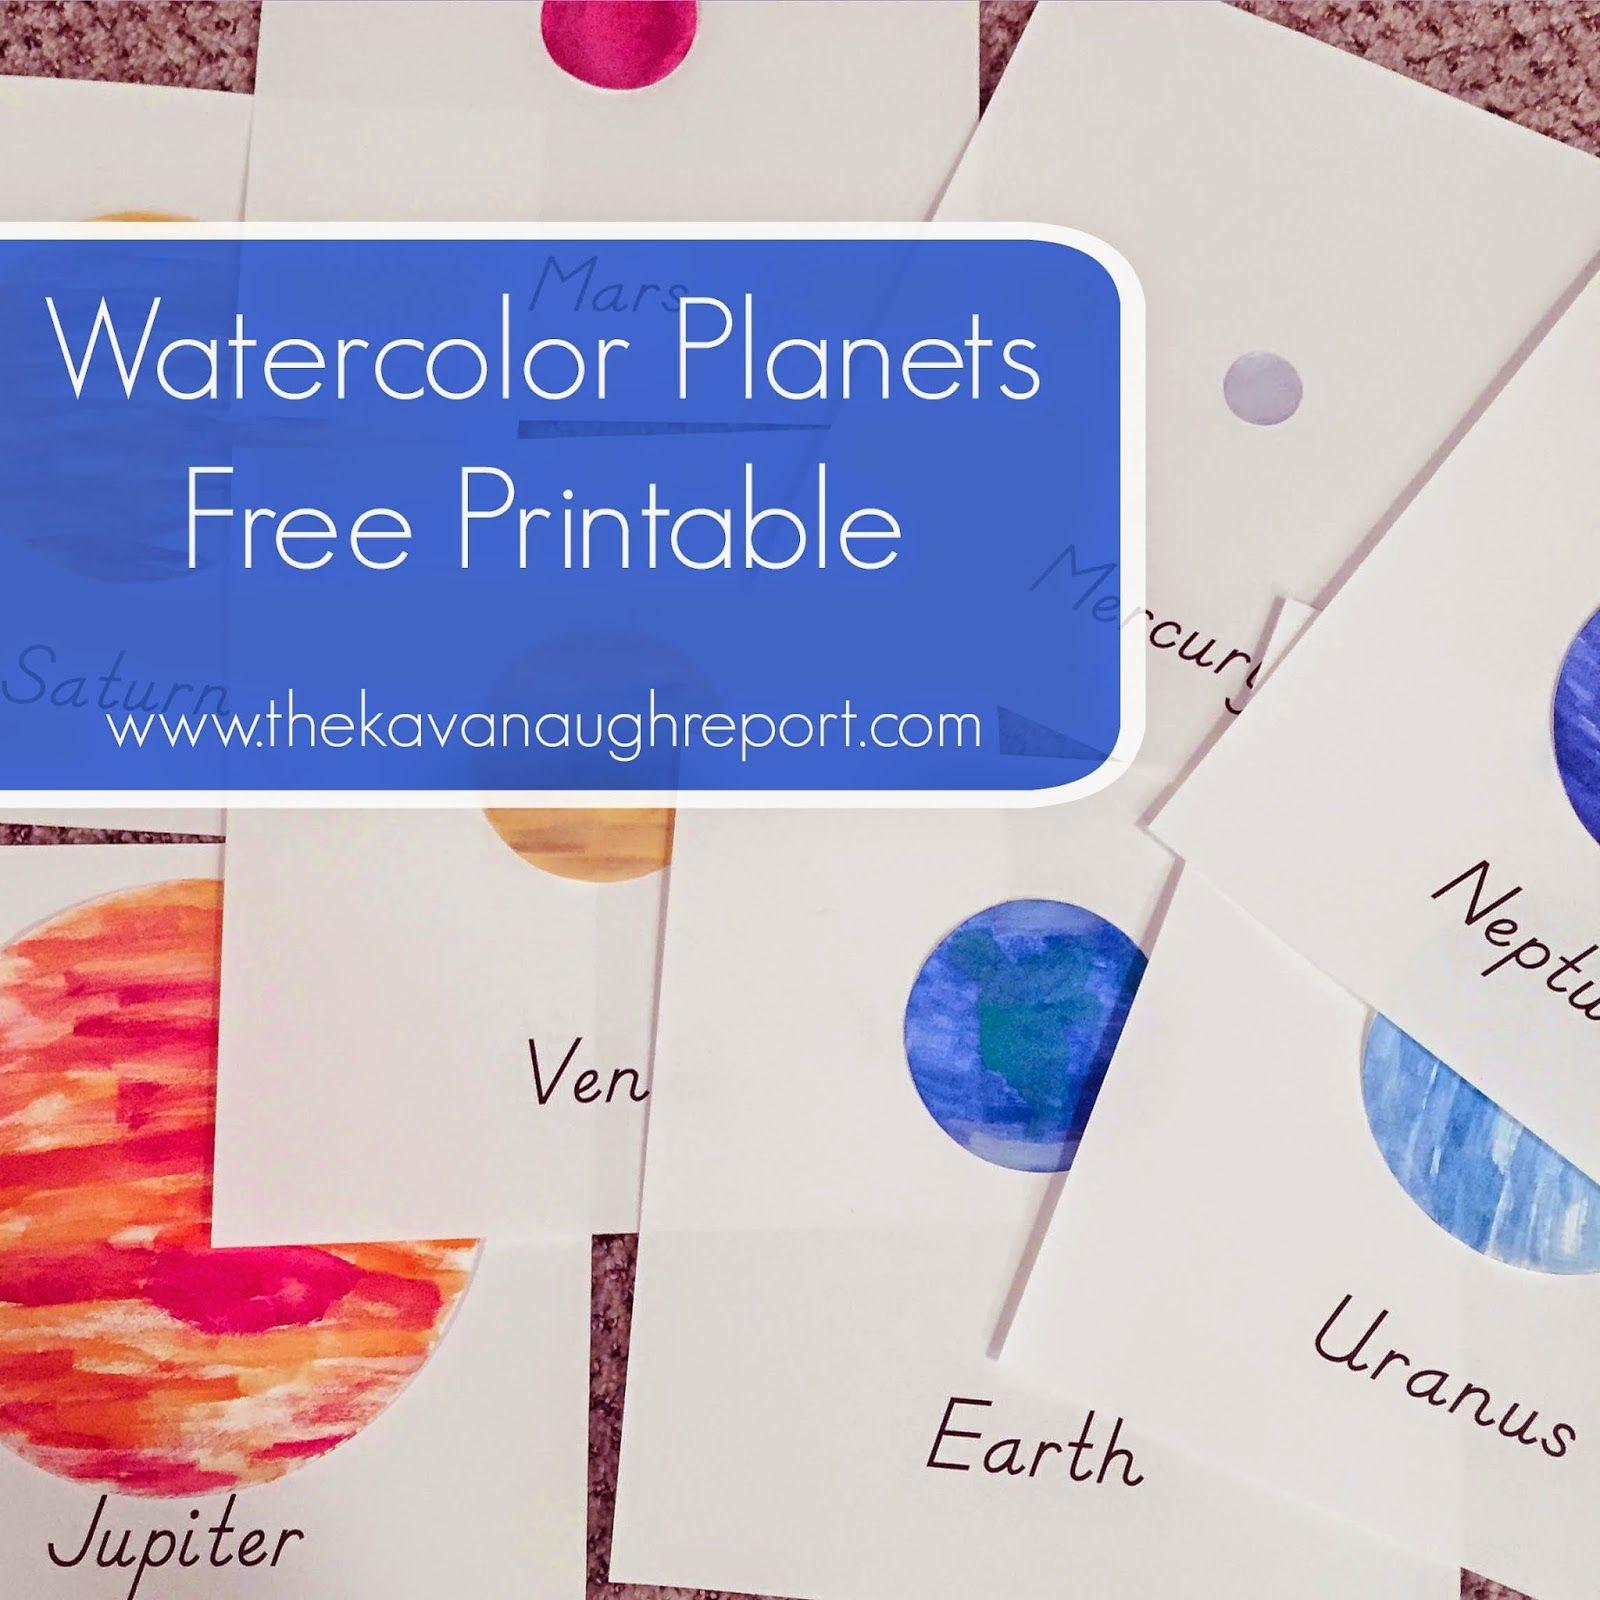 Watercolor Planets Printable